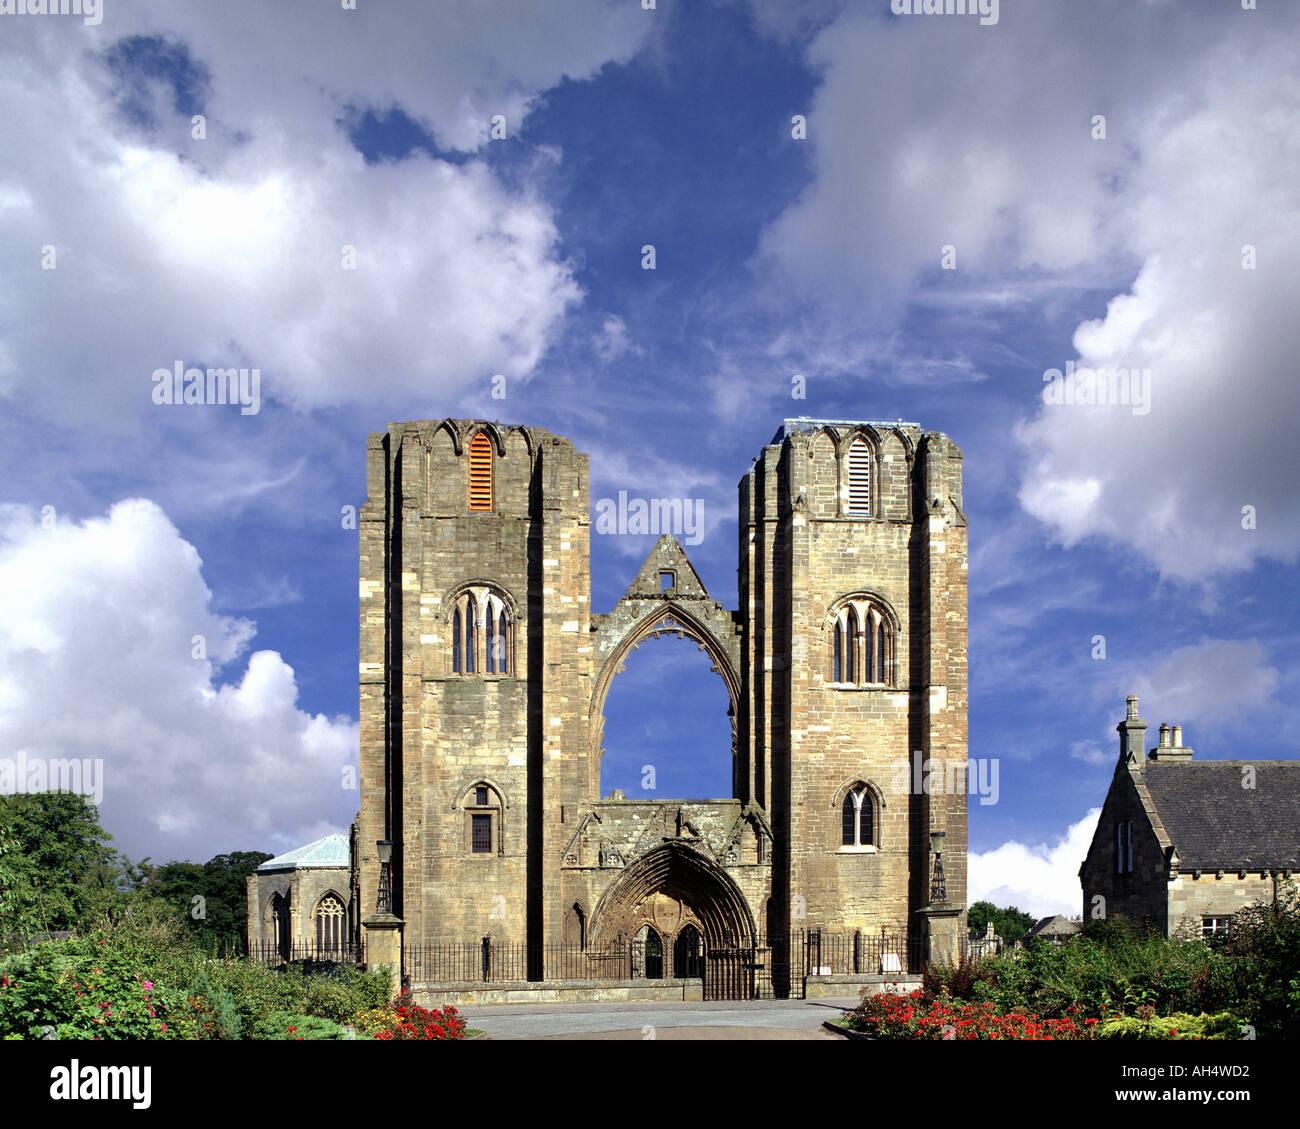 GB - SCOTLAND: Cathedral at Elgin - Stock Image